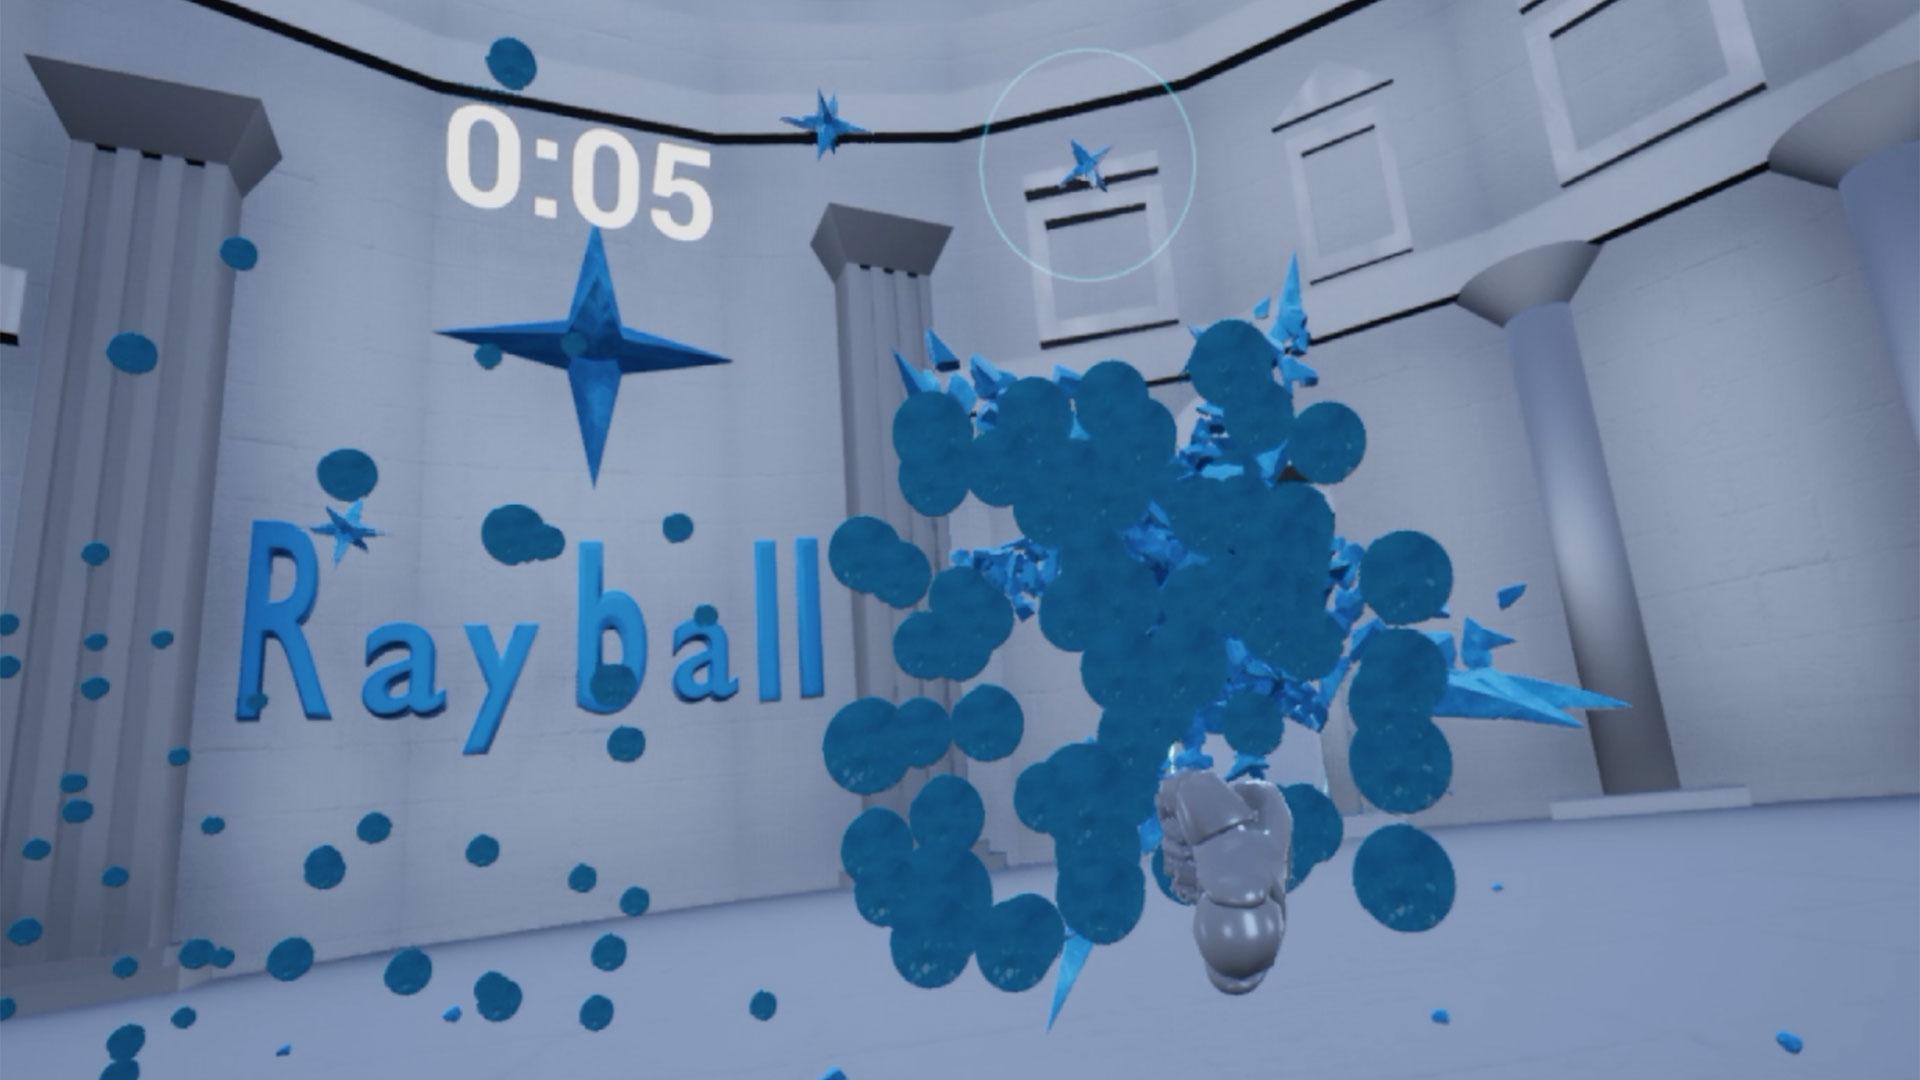 Rayball Free Download